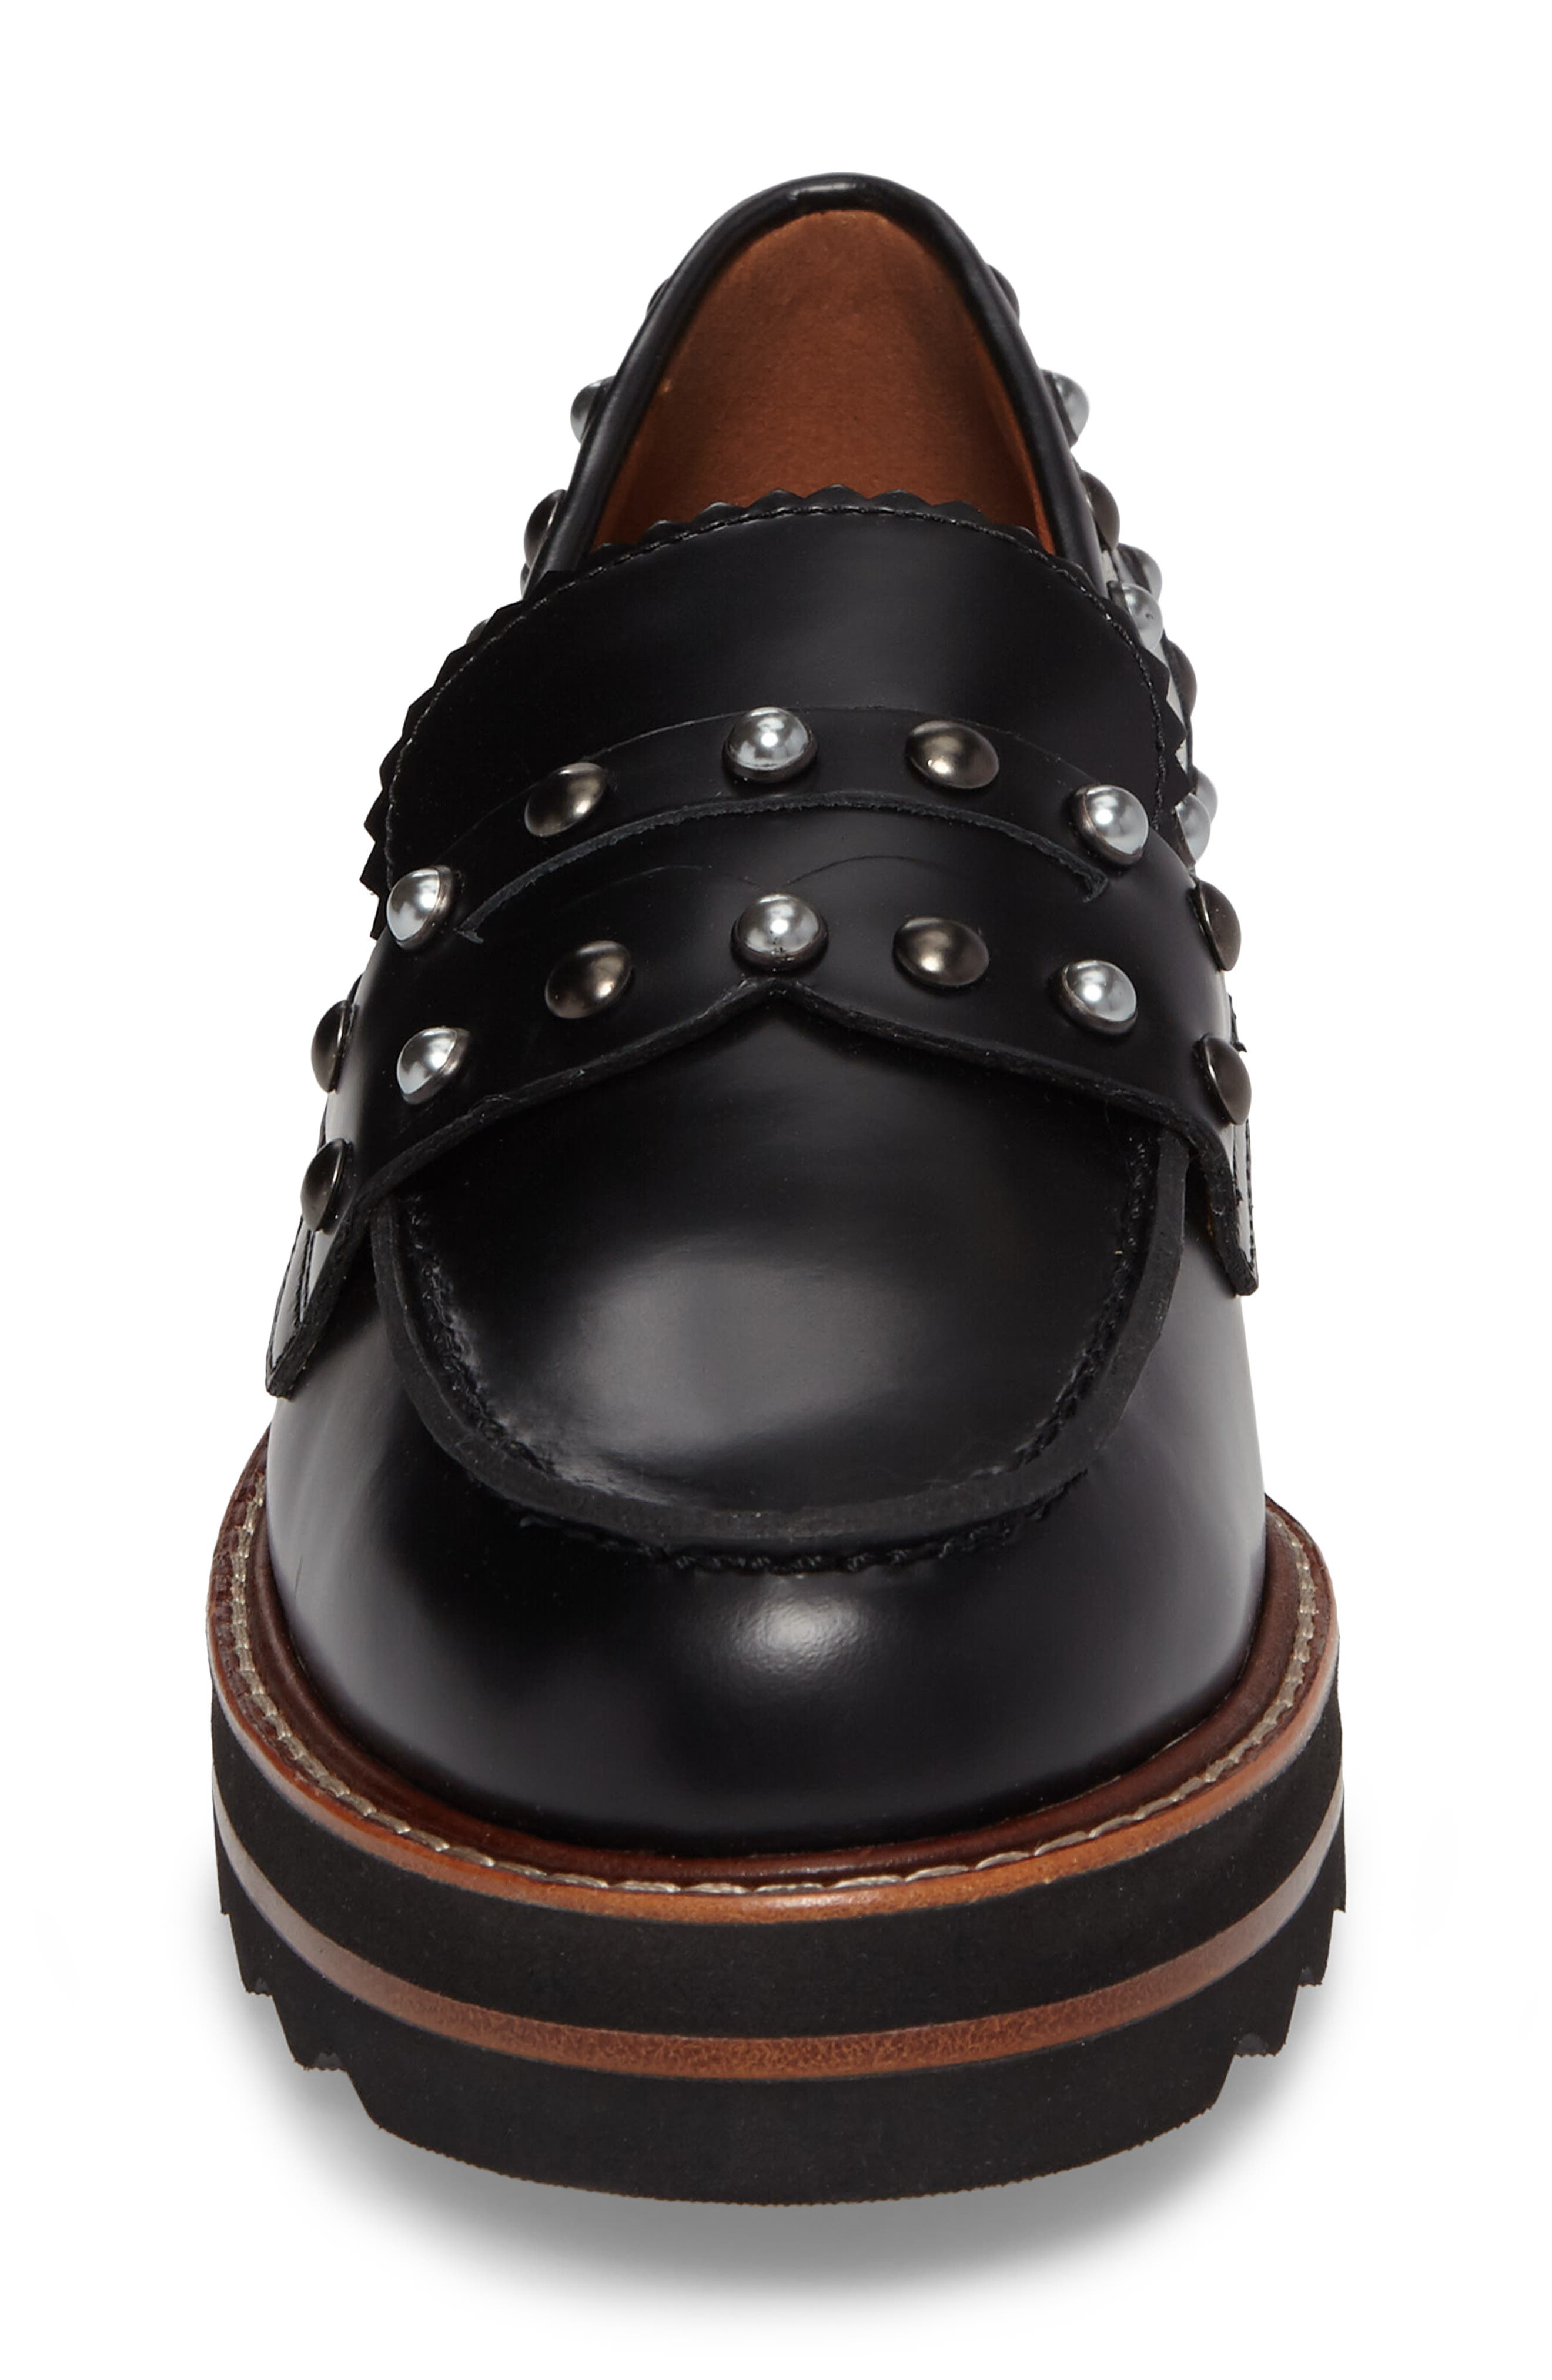 Lenox Loafer,                             Alternate thumbnail 4, color,                             Black Leather